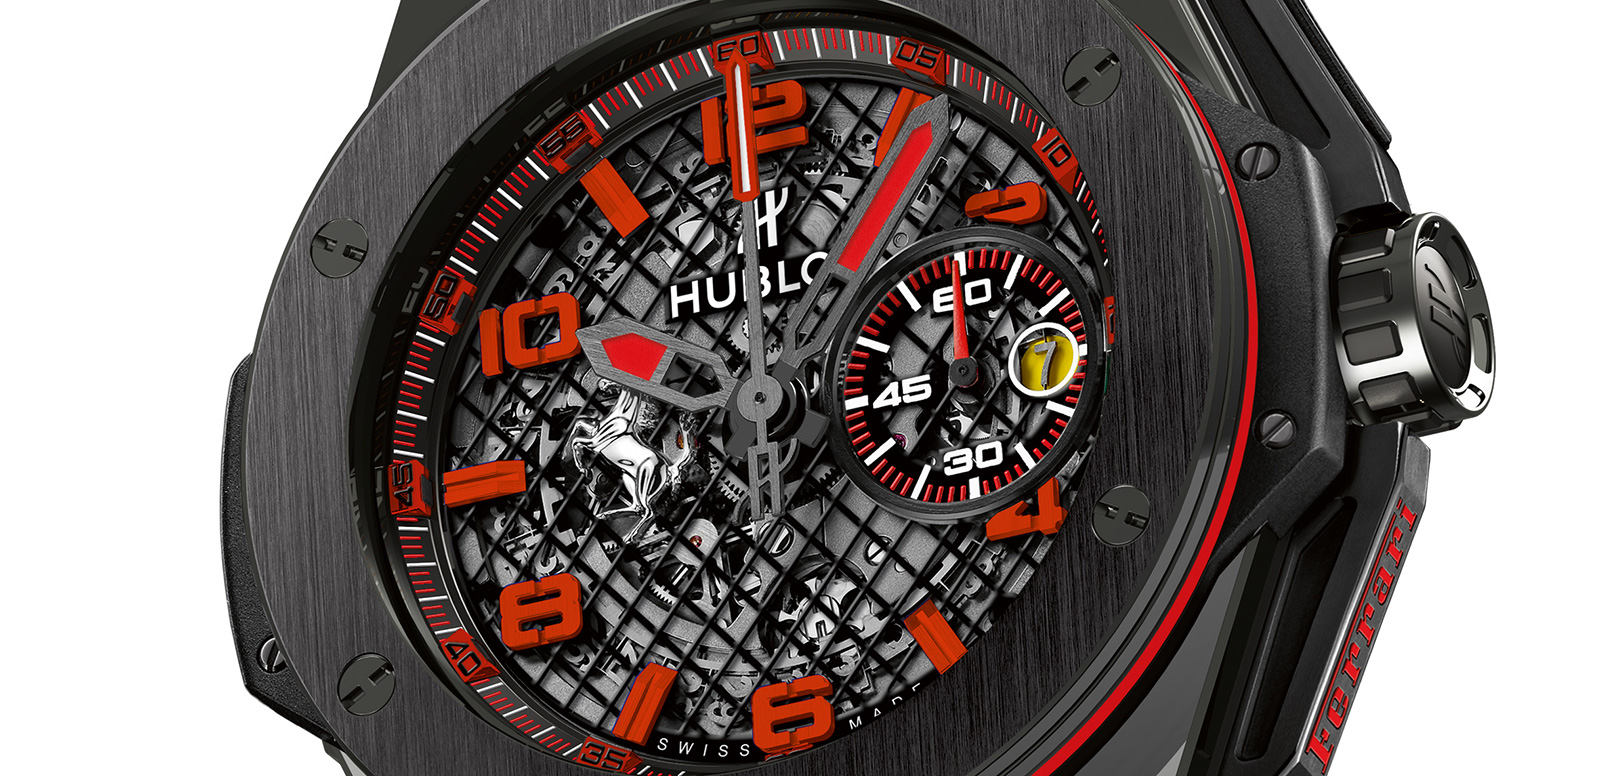 Introducing The Best Quality Skeleton Hublot Big Bang Ferrari Ceramic Replica Watch